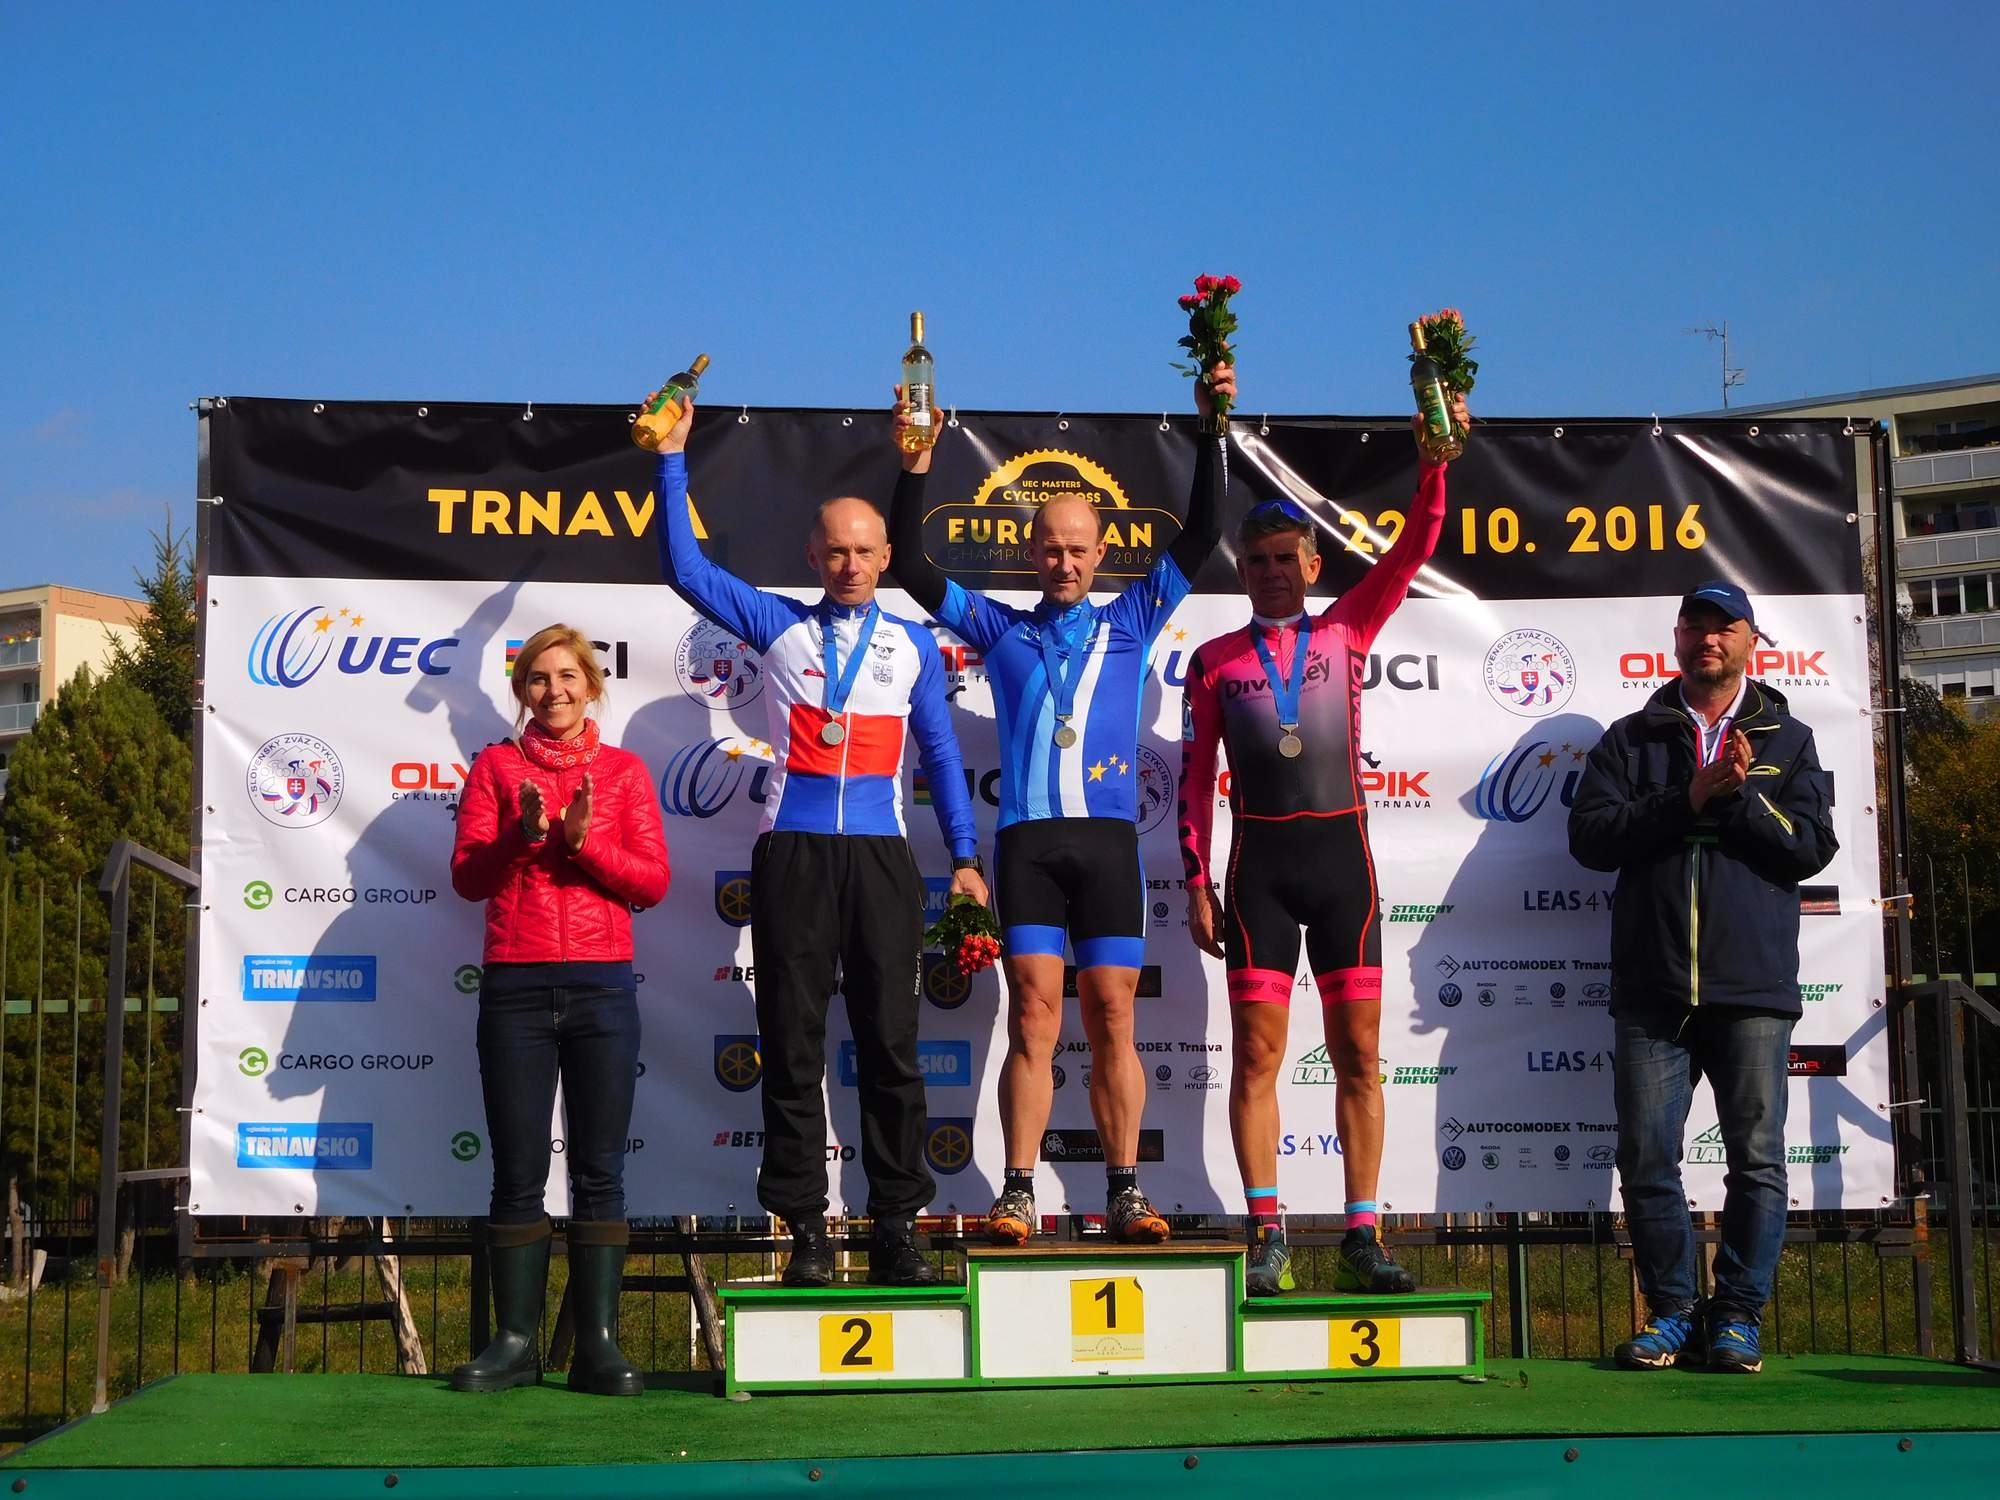 Diversey Team na Mistrzostwach Europy Masters CX, Trnava